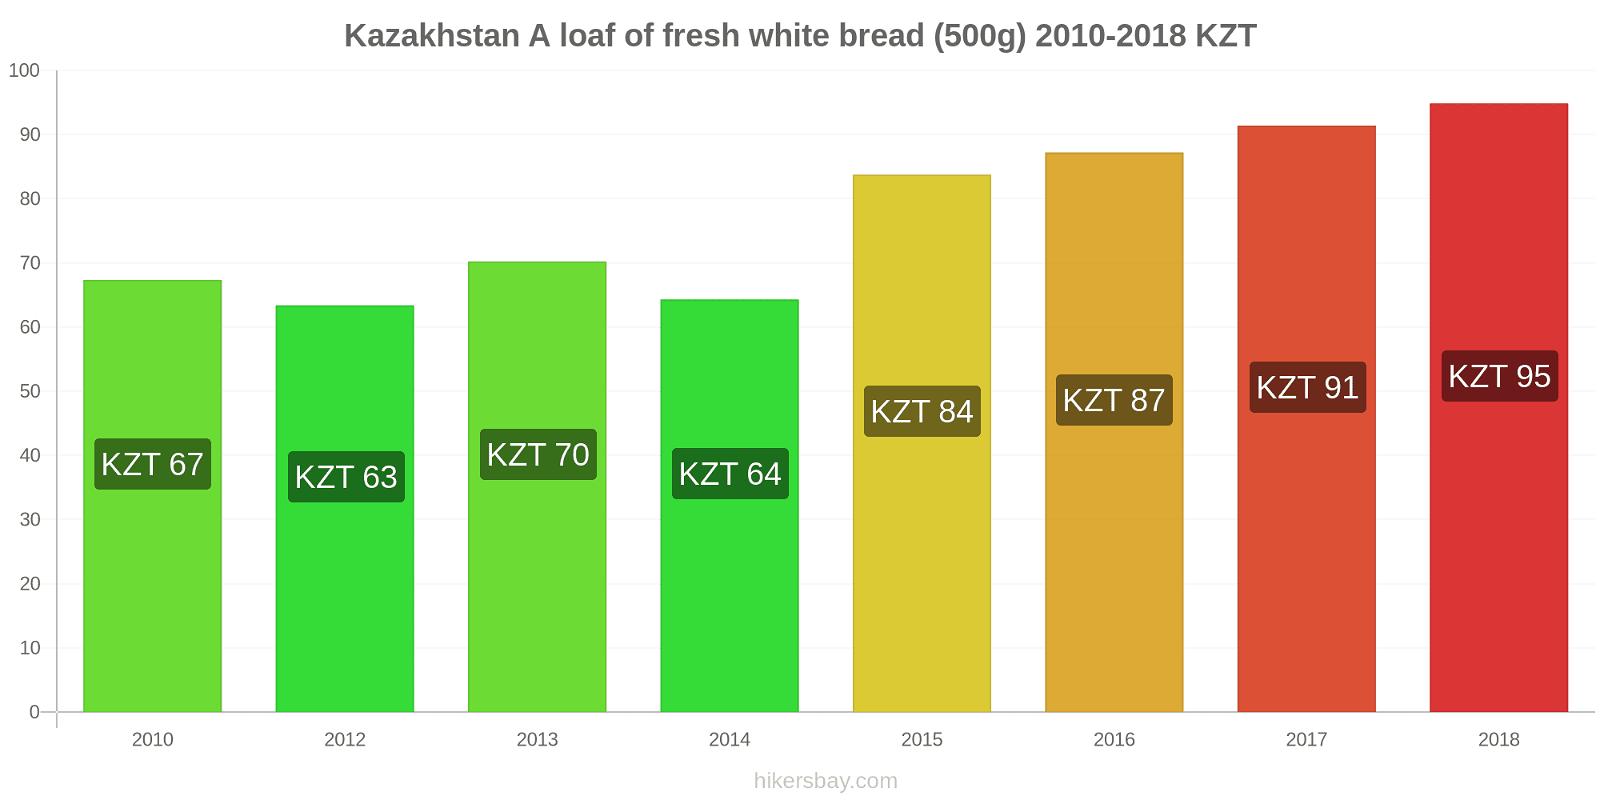 Kazakhstan price changes A loaf of fresh white bread (500g) hikersbay.com